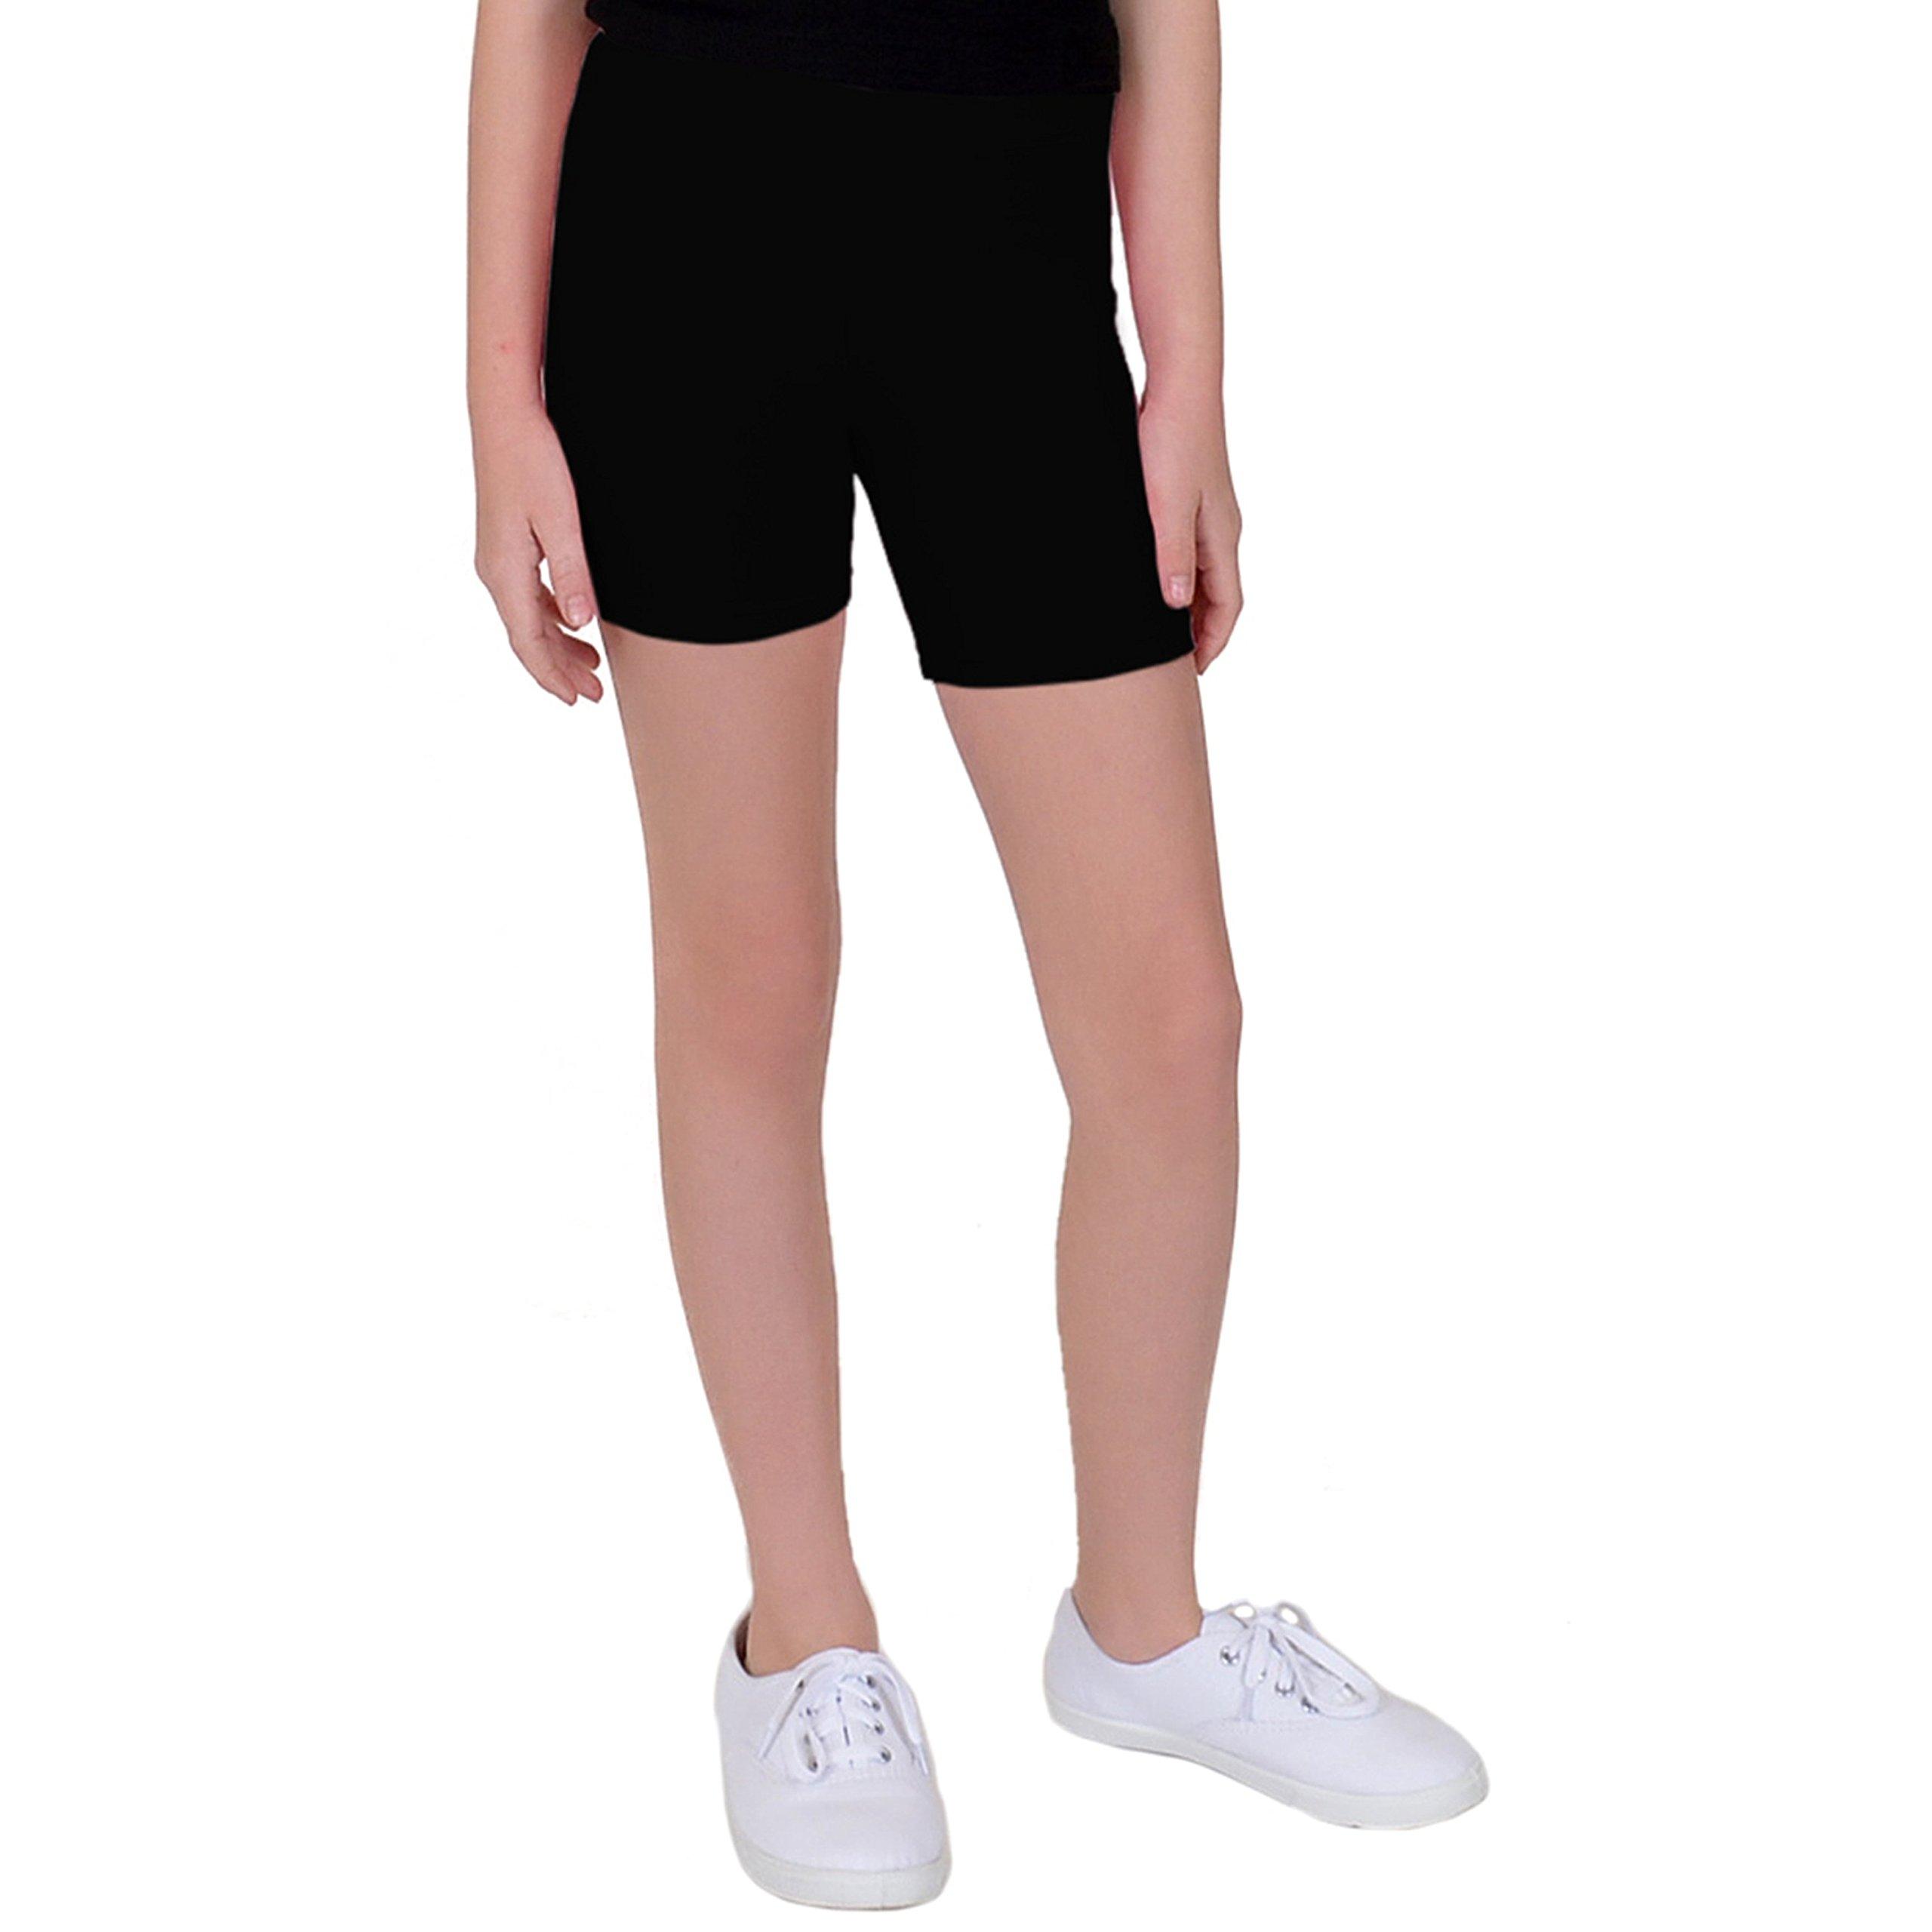 Stretch is Comfort GP Girl's Plus Size Cotton Biker Shorts Black X-Large